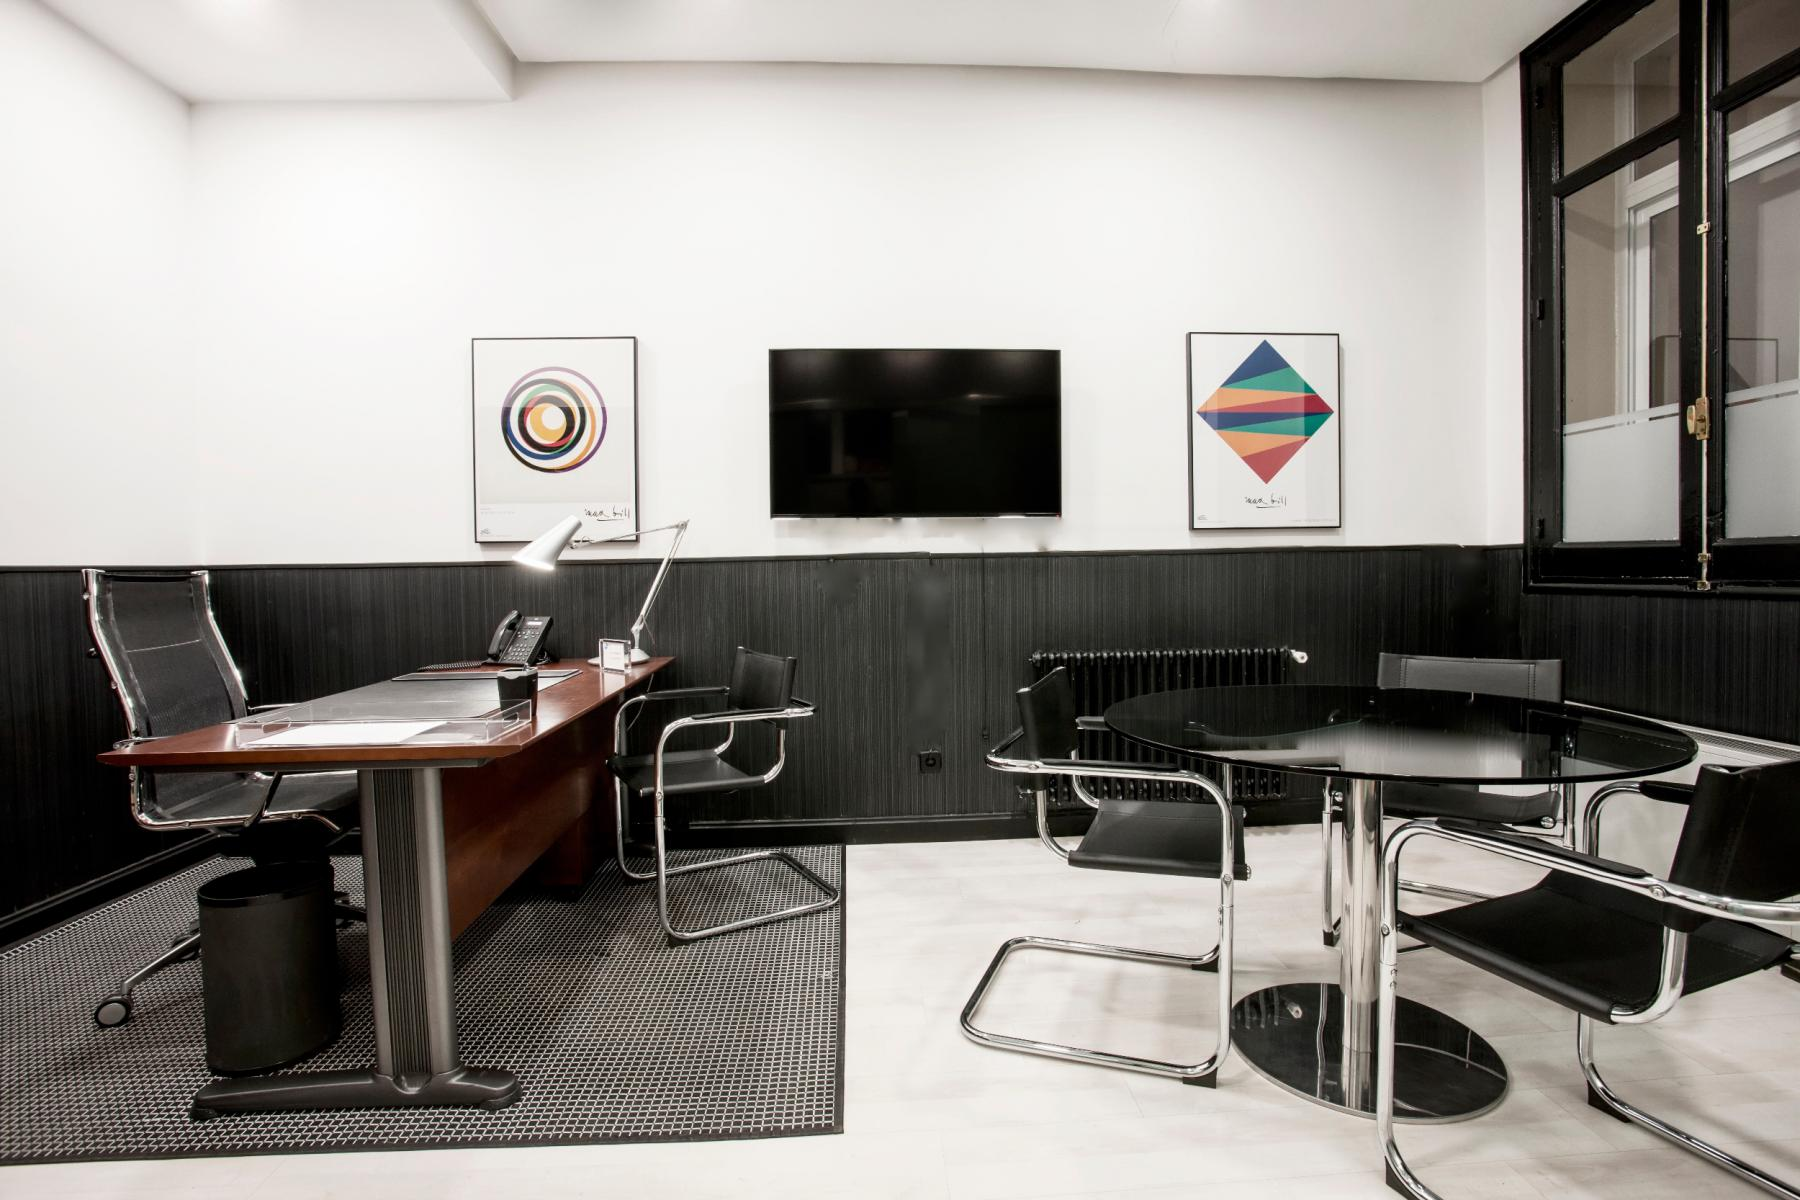 Alquilar oficinas Calle de Velázquez 53, Madrid (6)